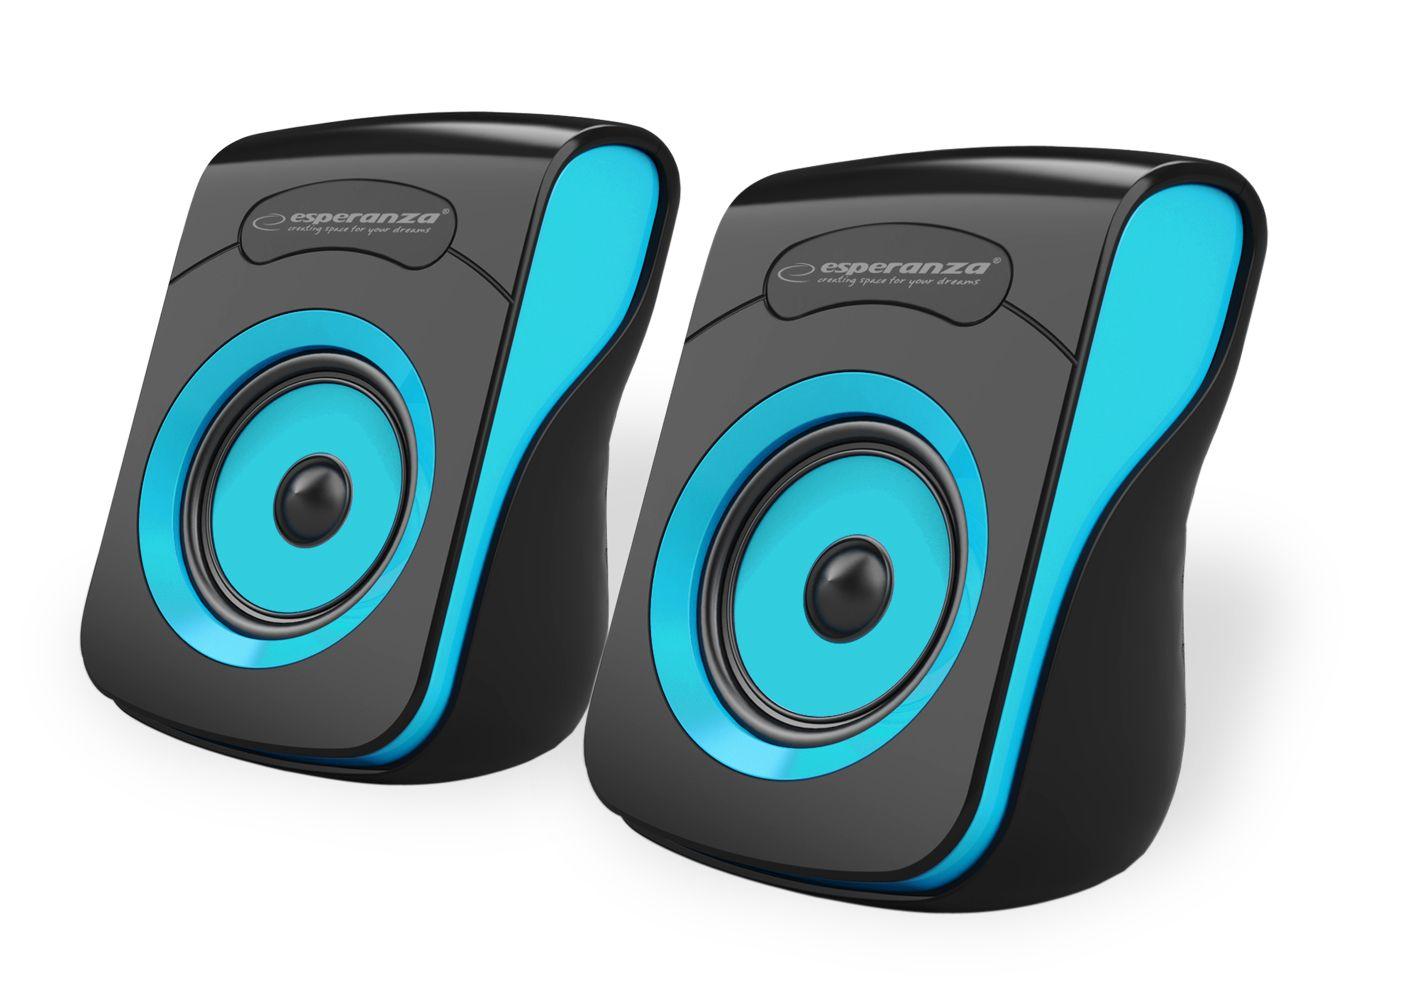 Hangszóró Esperanza Flamenco USB Stereo Speakers Black/Blue